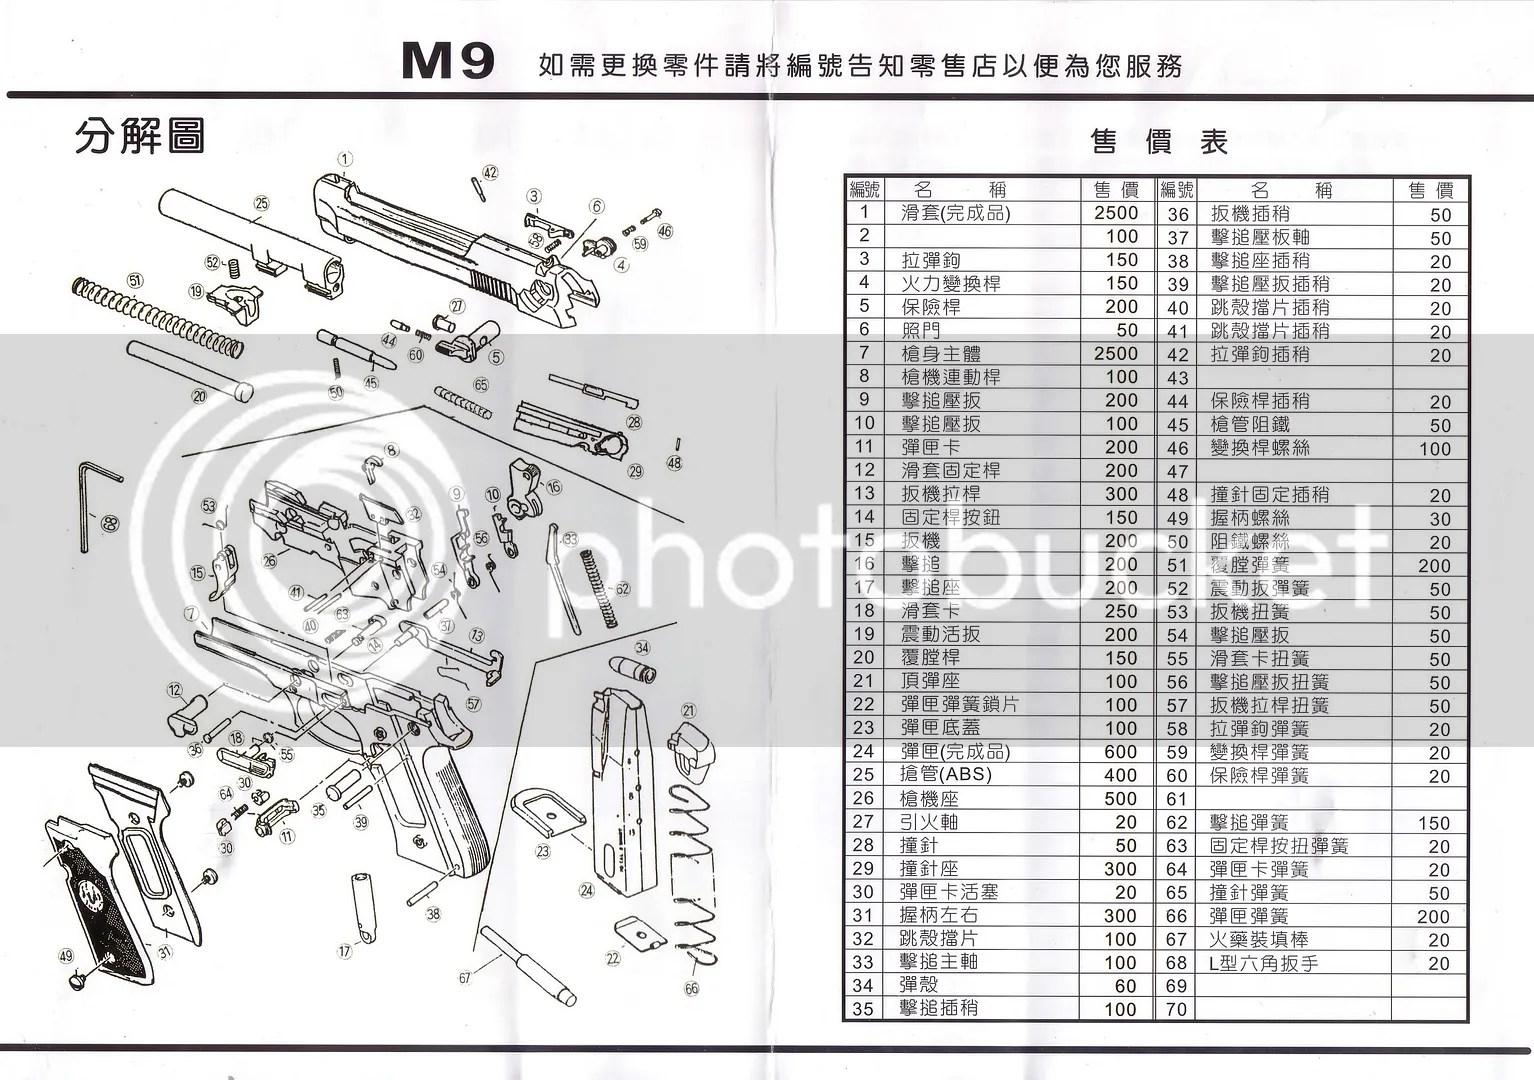 M9 Parts Gallery